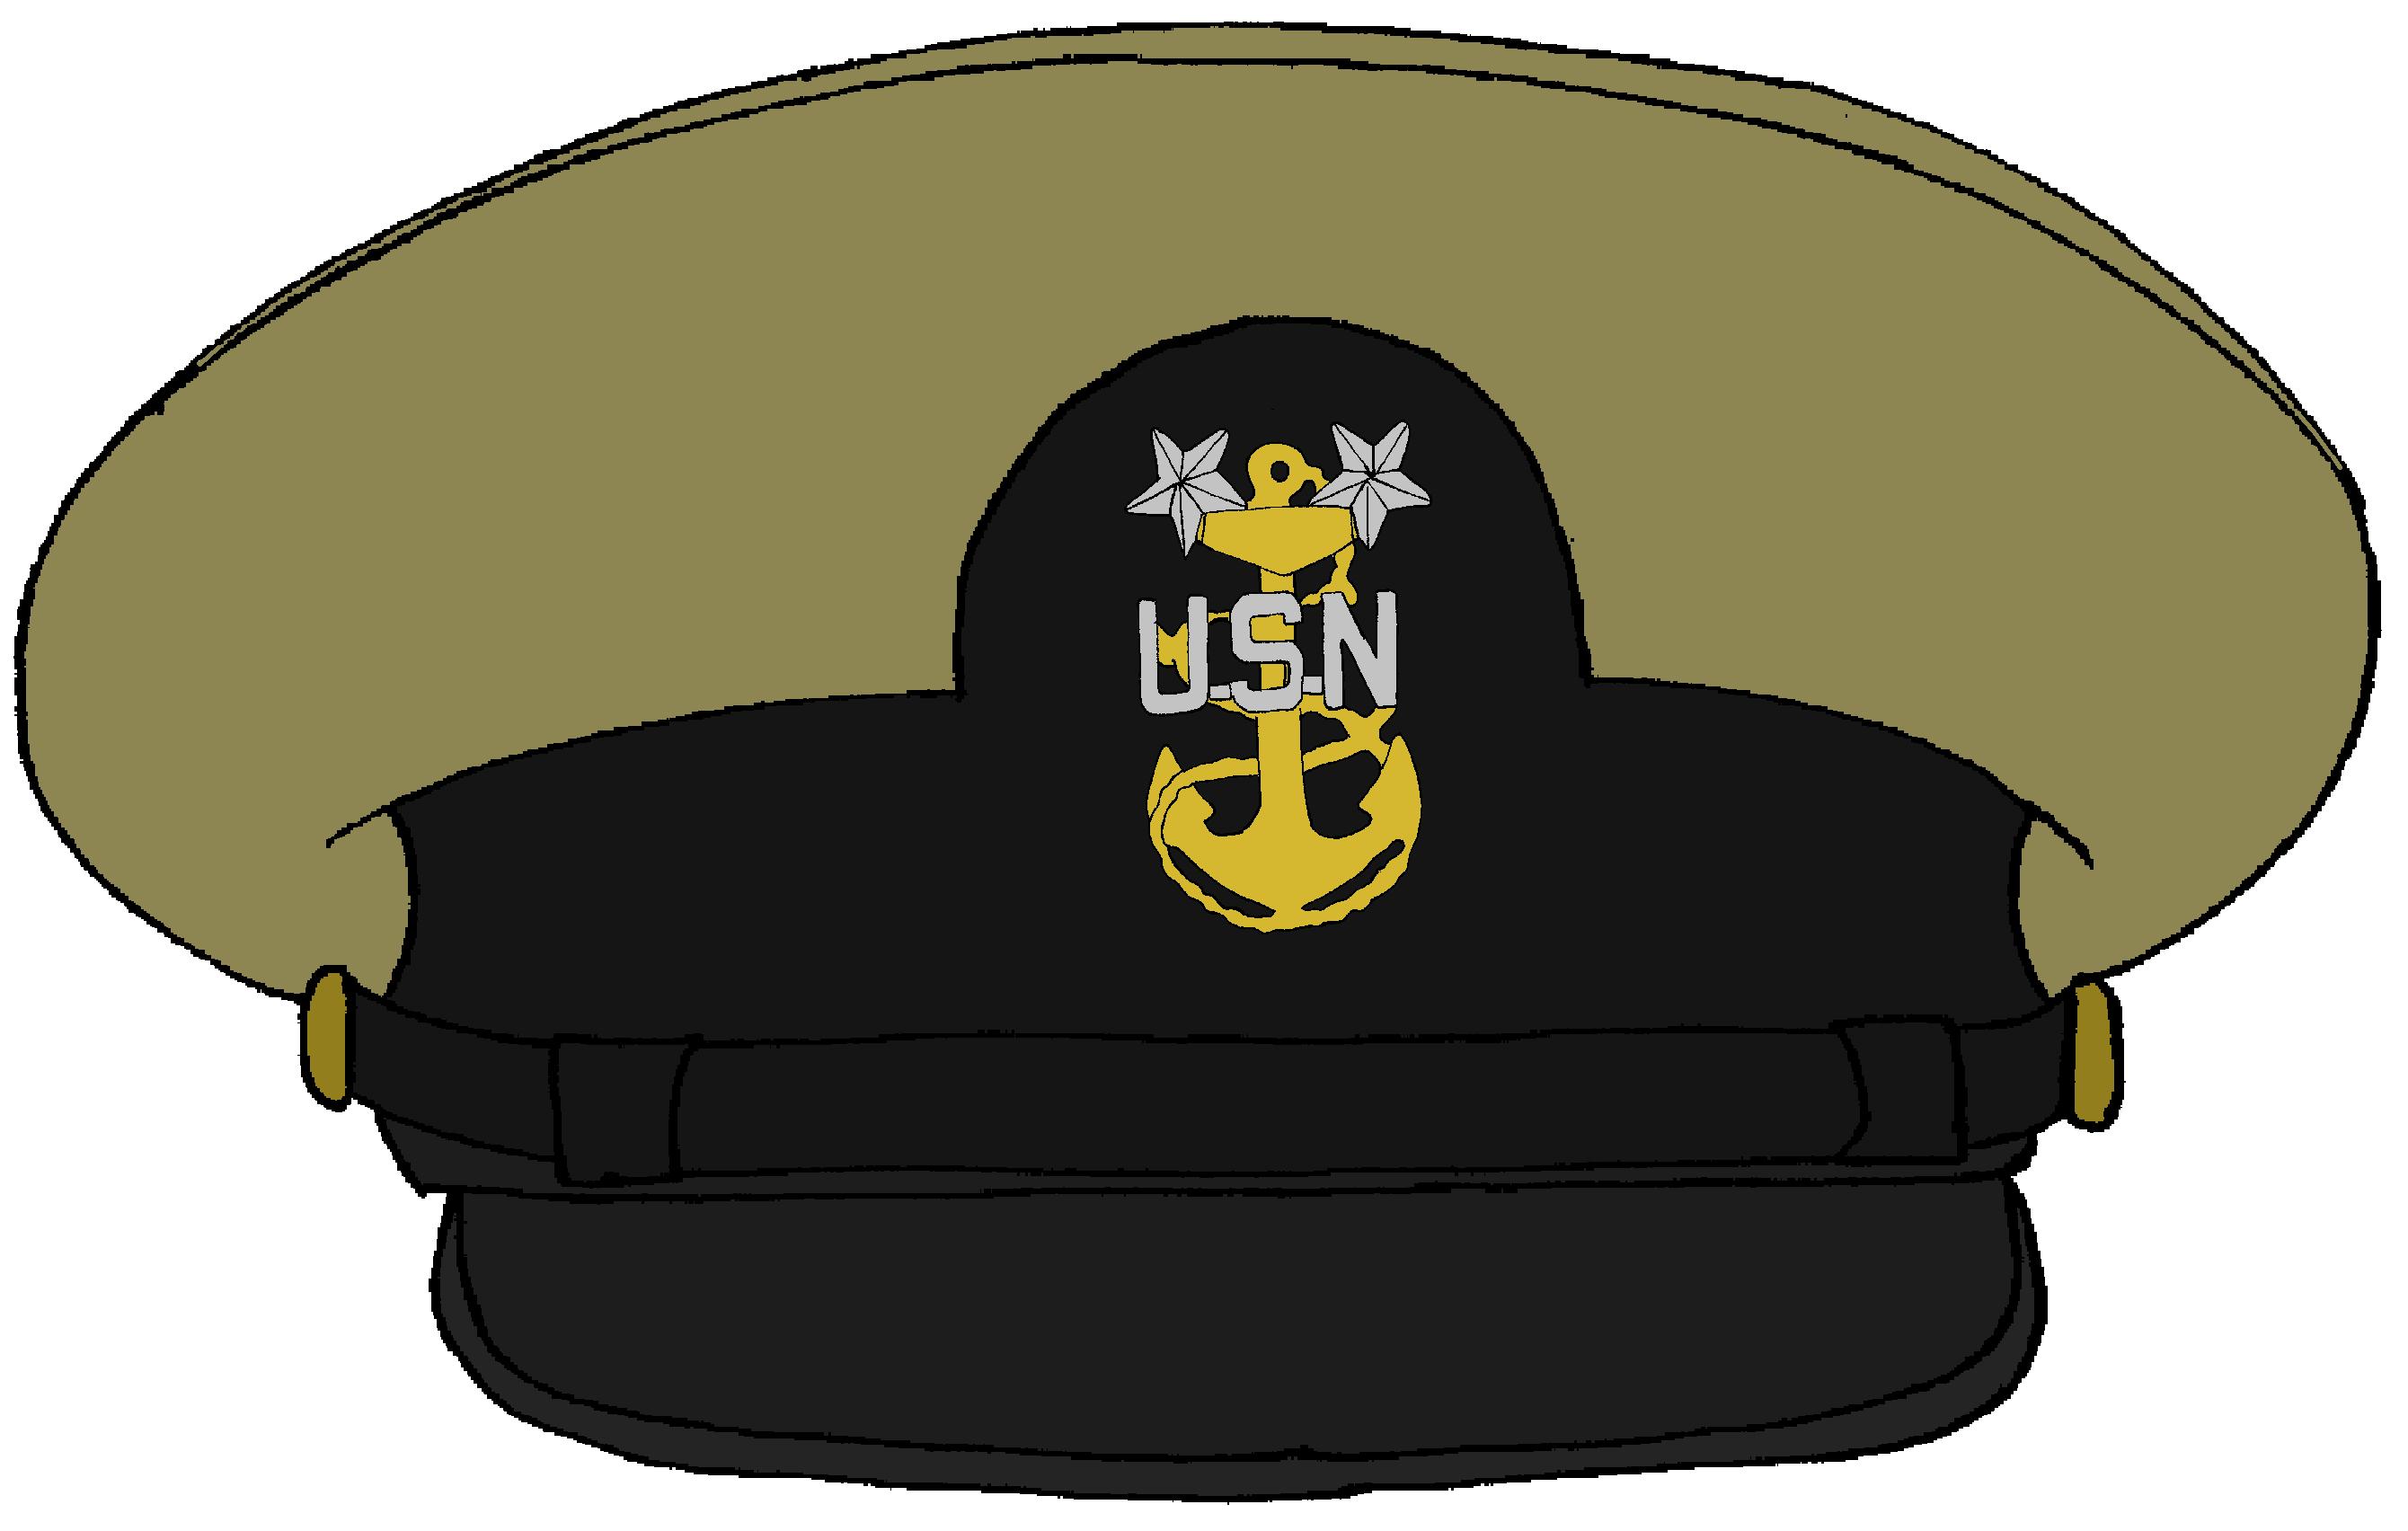 735ef9a43 US Navy Master Chief Petty Officer Khaki Hat   Navy   Navy chief ...